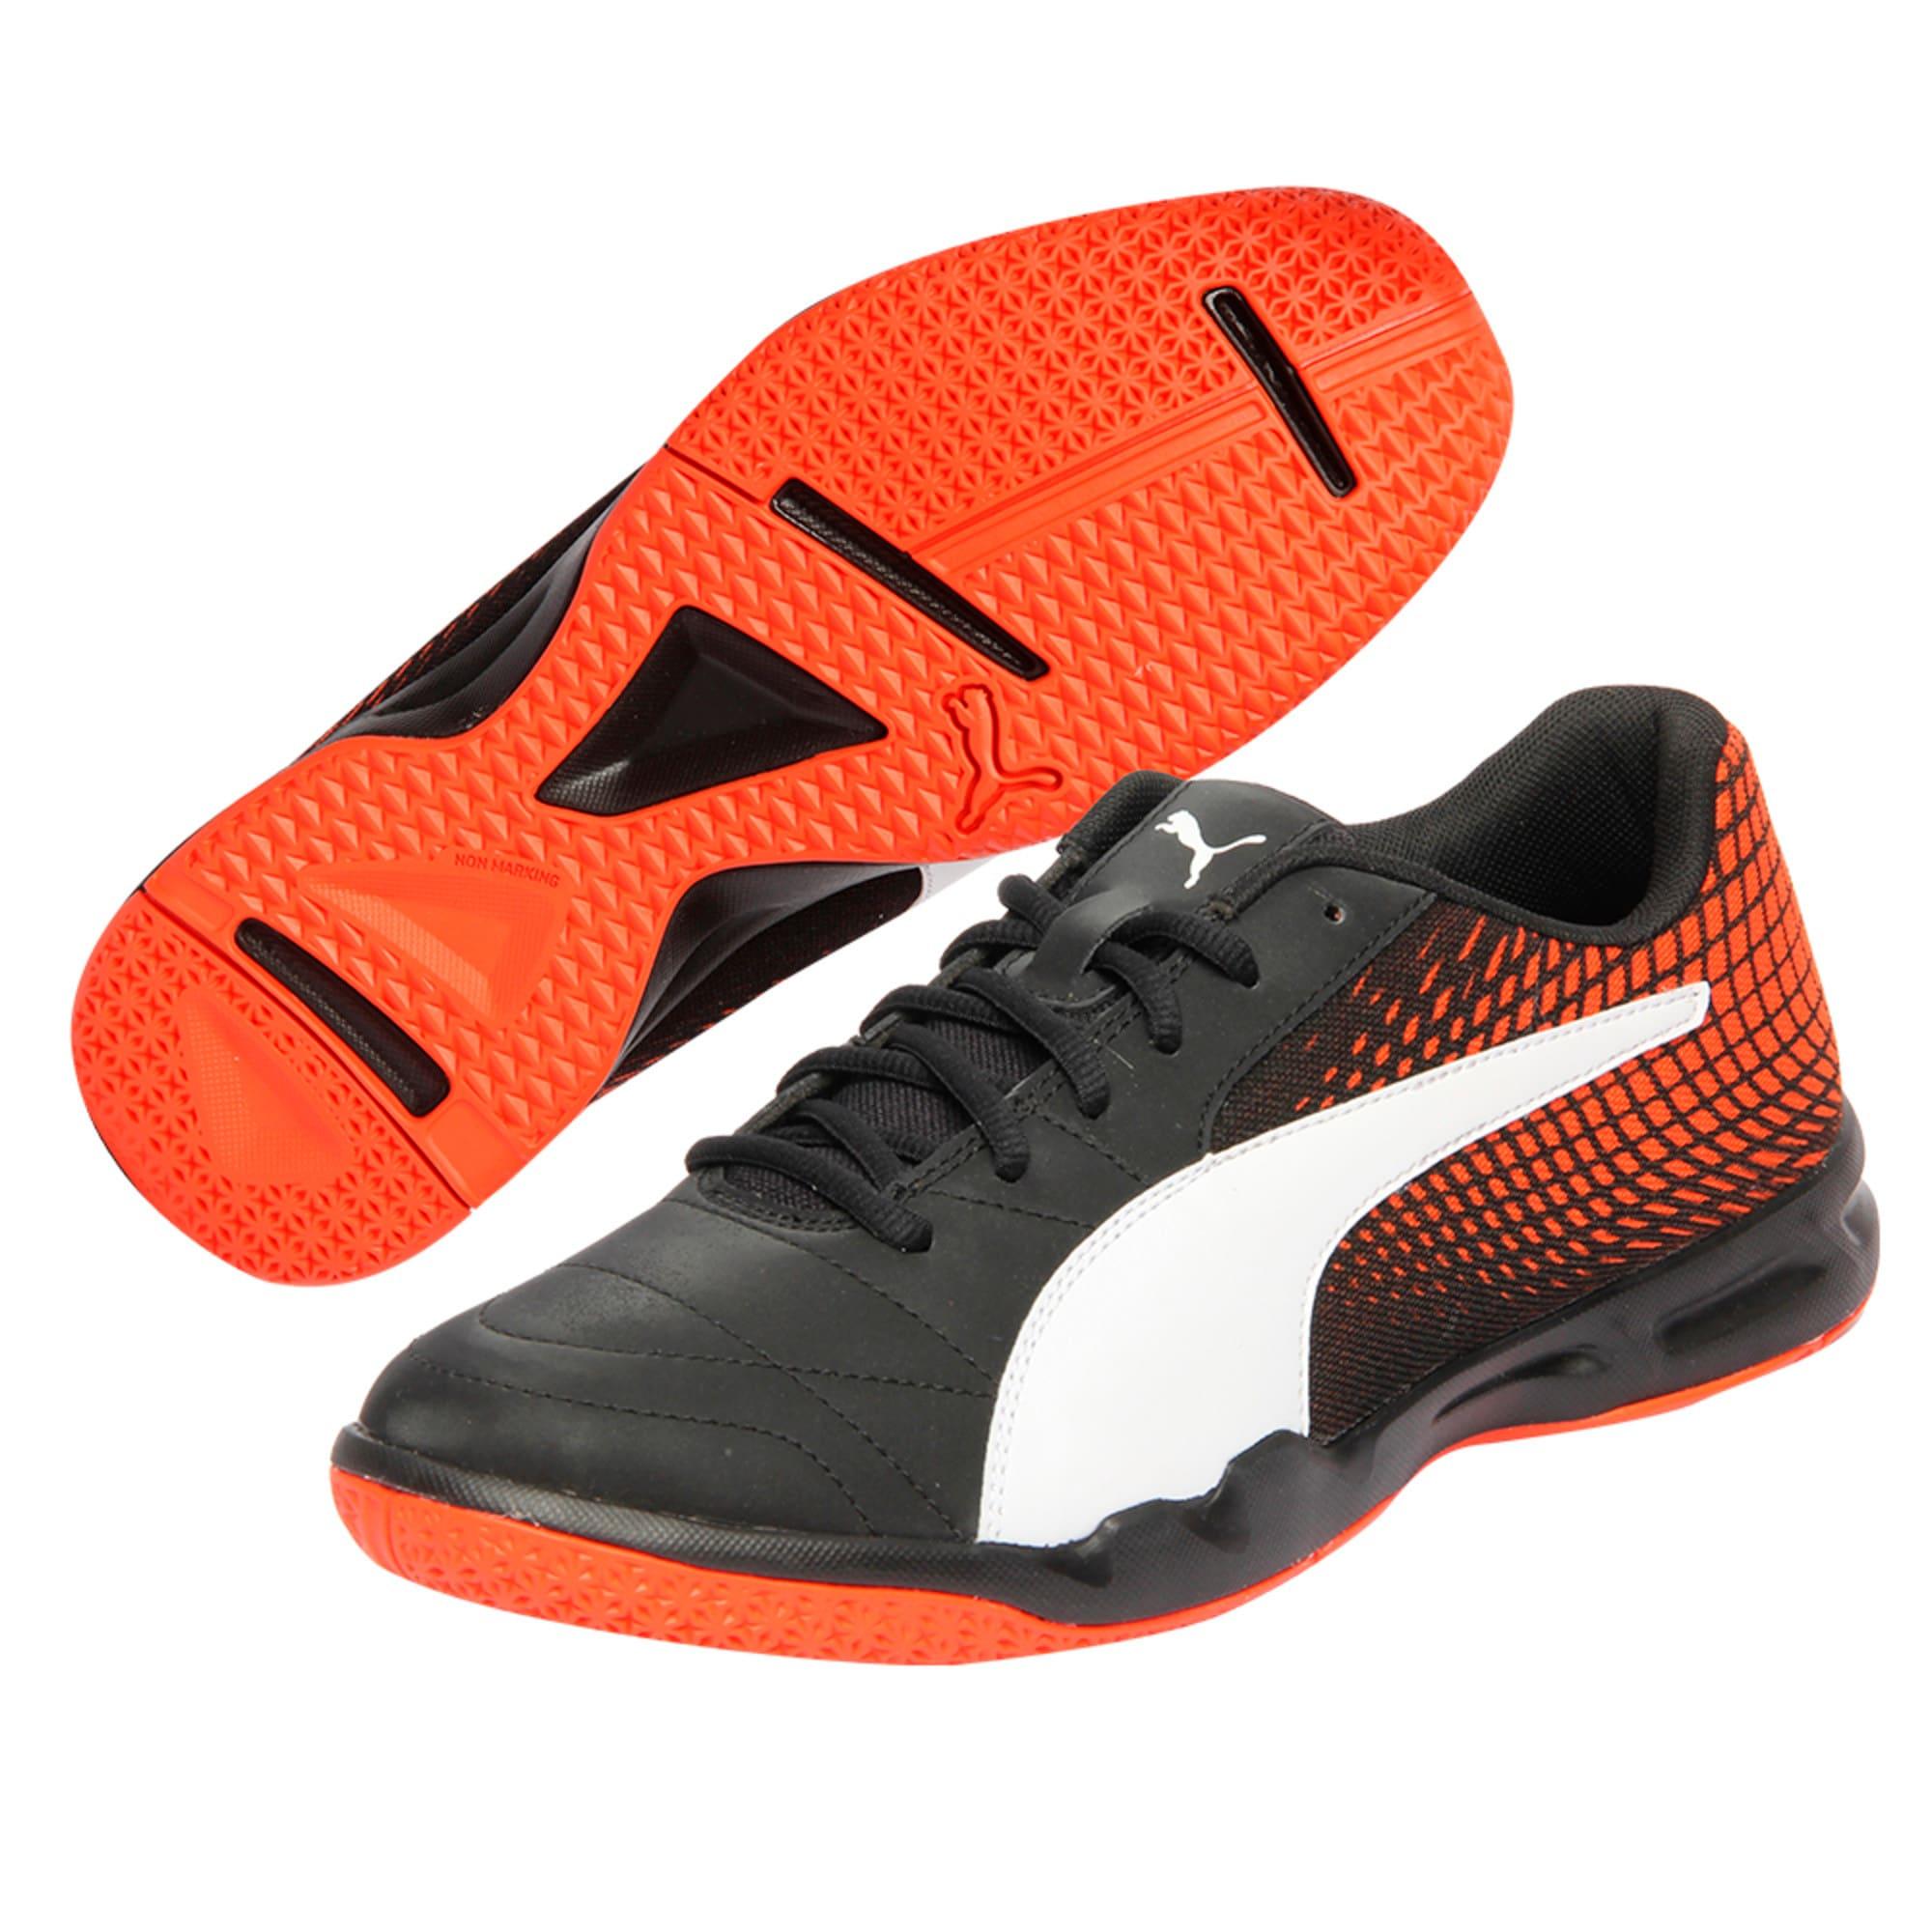 Thumbnail 6 of Veloz Indoor NG Training Shoes, Black-White-Cherry, medium-IND